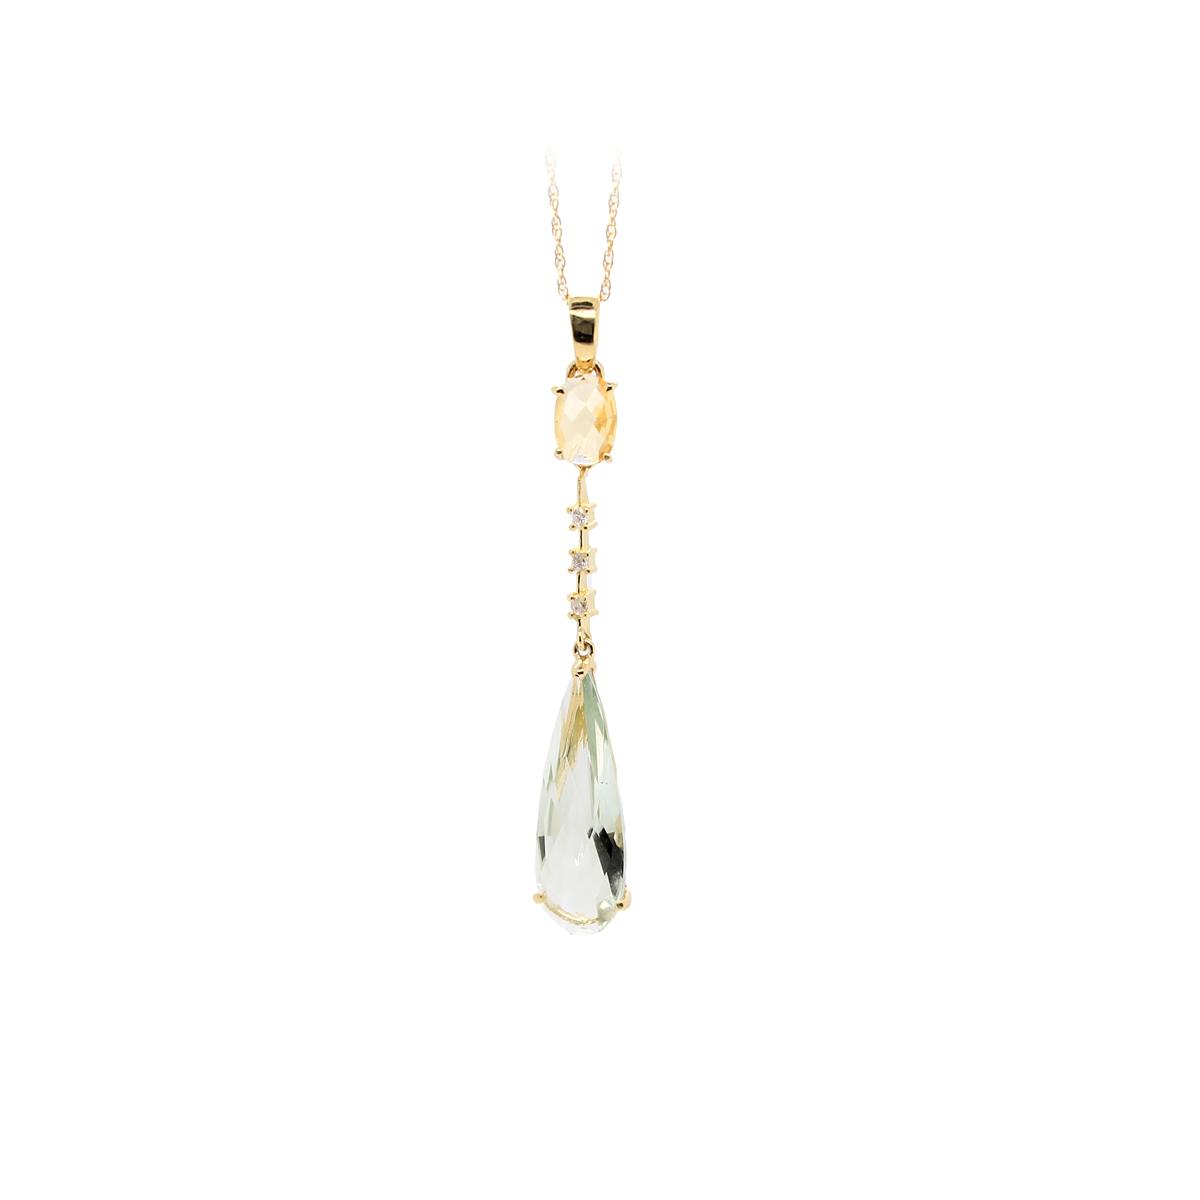 Vintage 14 Karat Yellow Gold Citrine, Diamond and Green Quartz Pendant Necklace